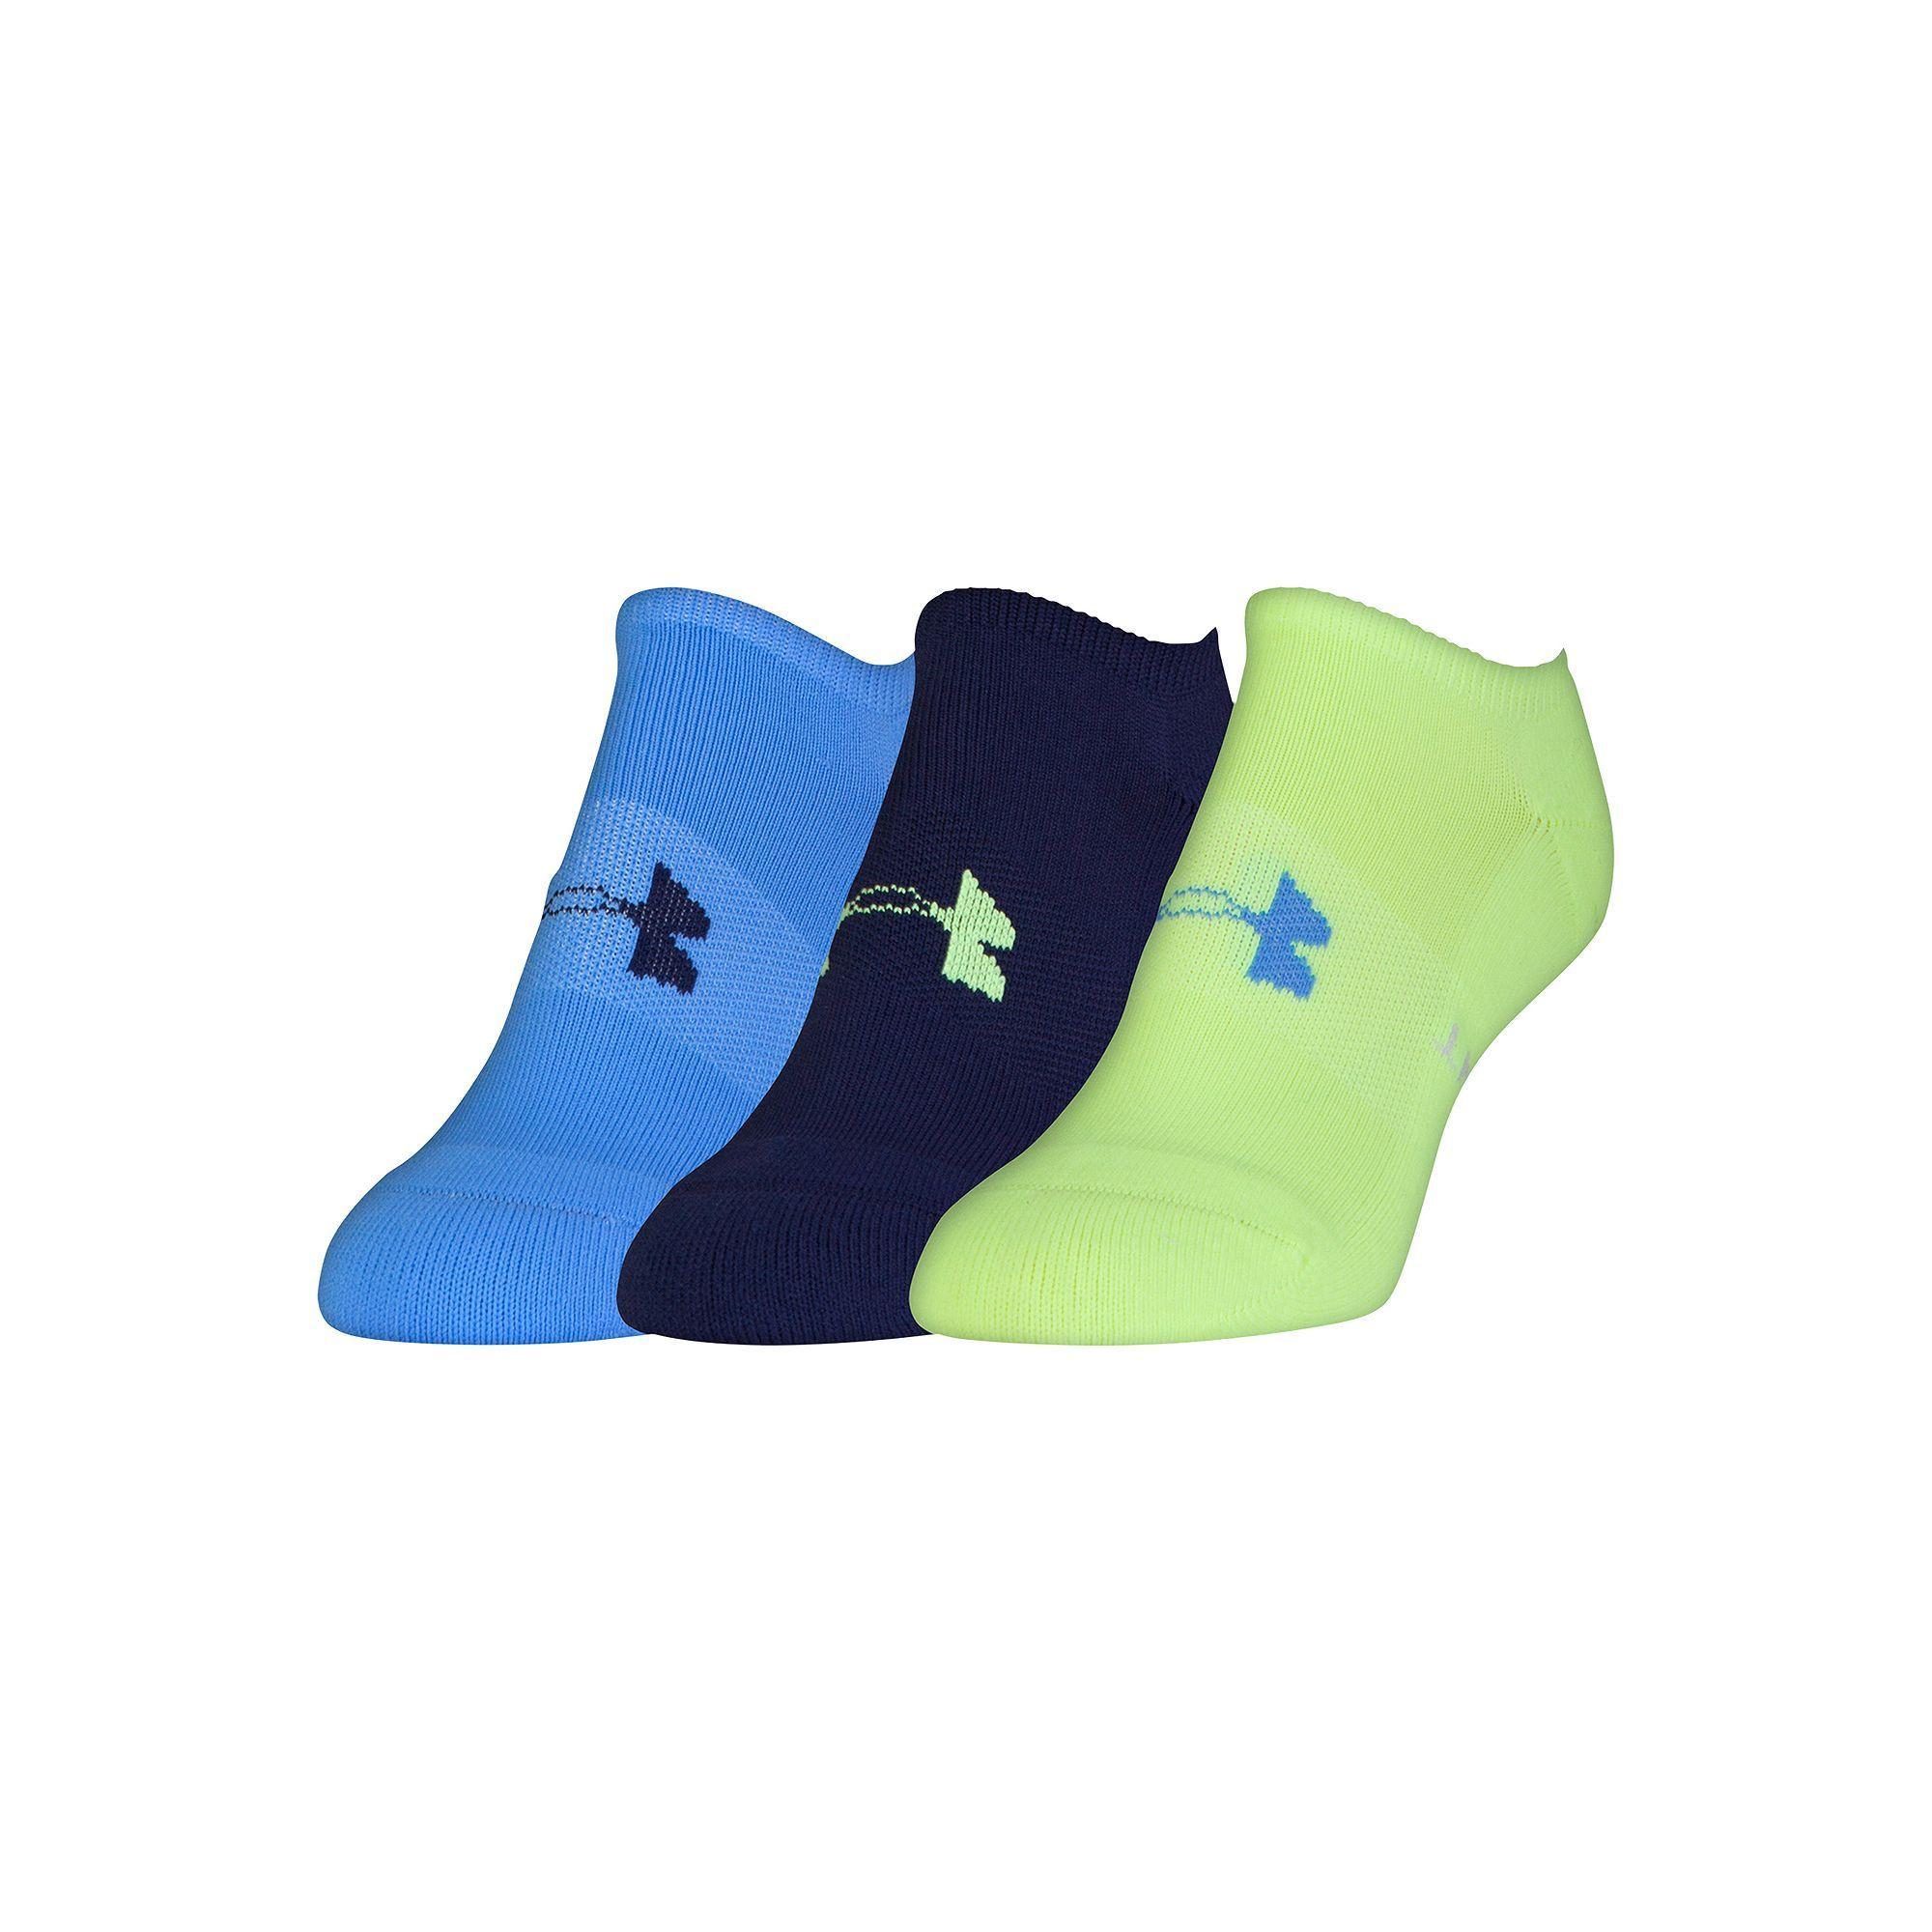 8b5423fc3 Women's Under Armour 3-pk. Athletic Solo Low-Cut Socks, Size: Medium, Ovrfl  Oth